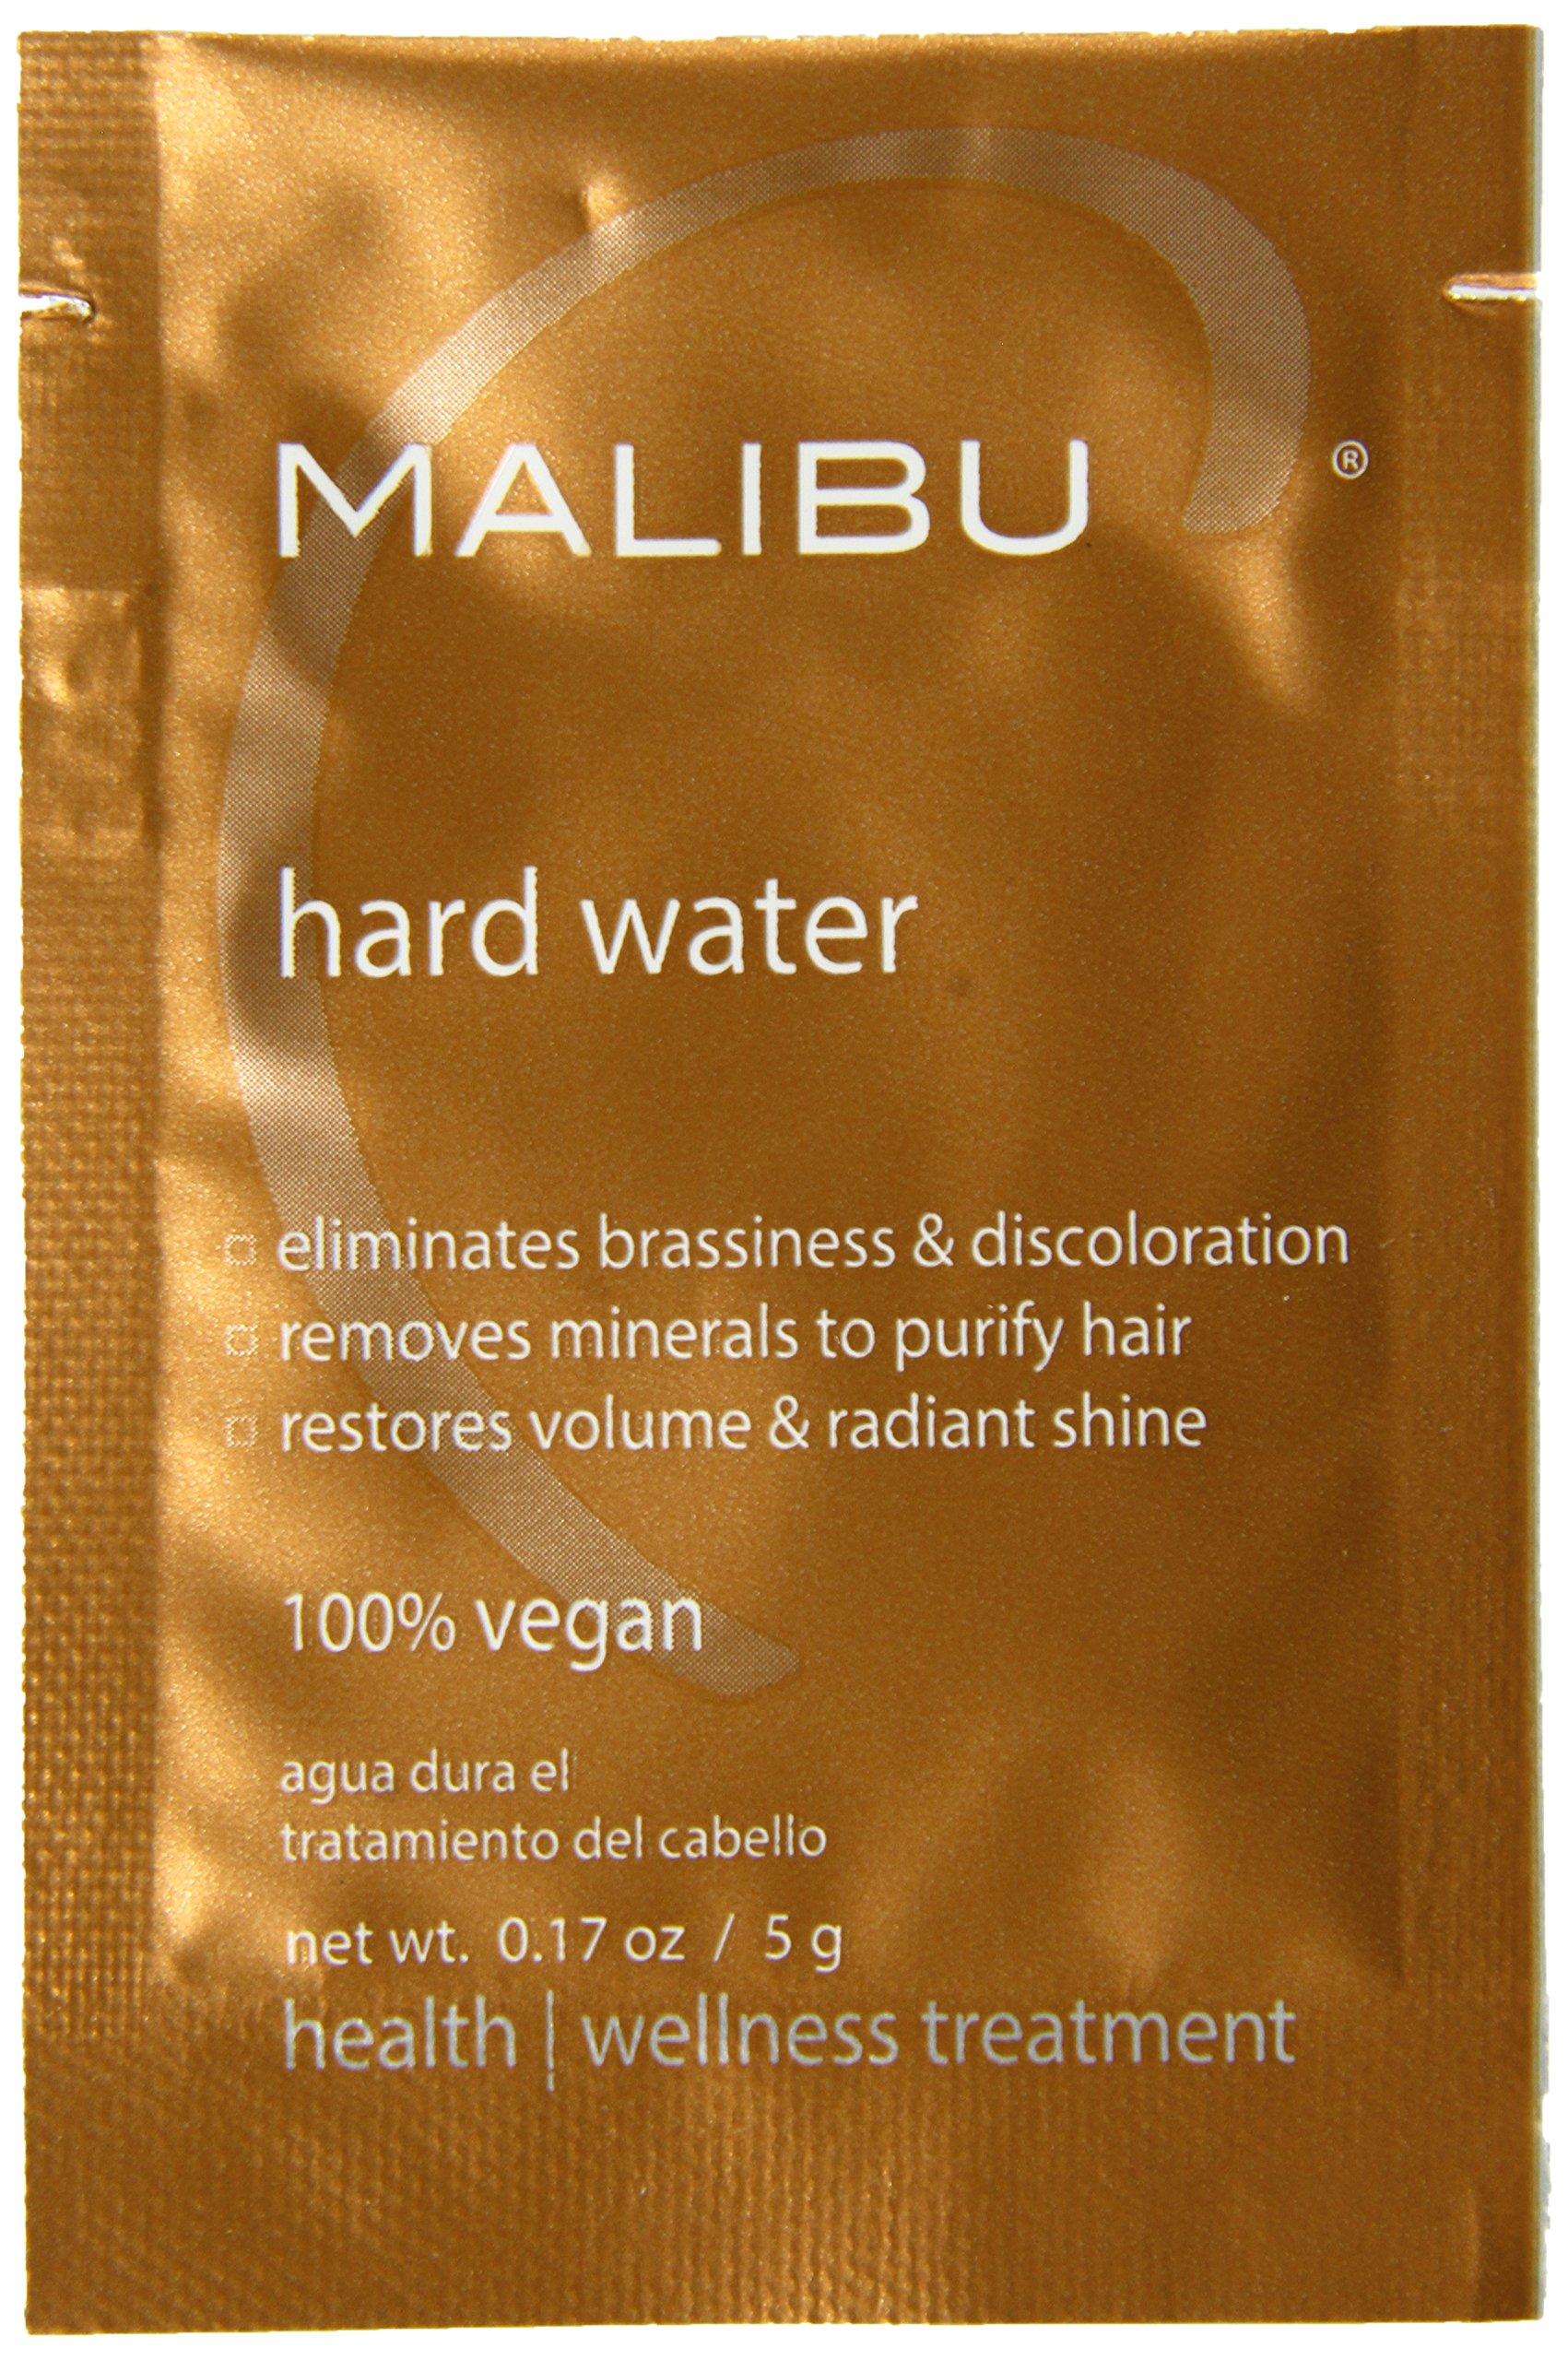 Malibu C Hard Water Weekly Demineralizer 12-pk.